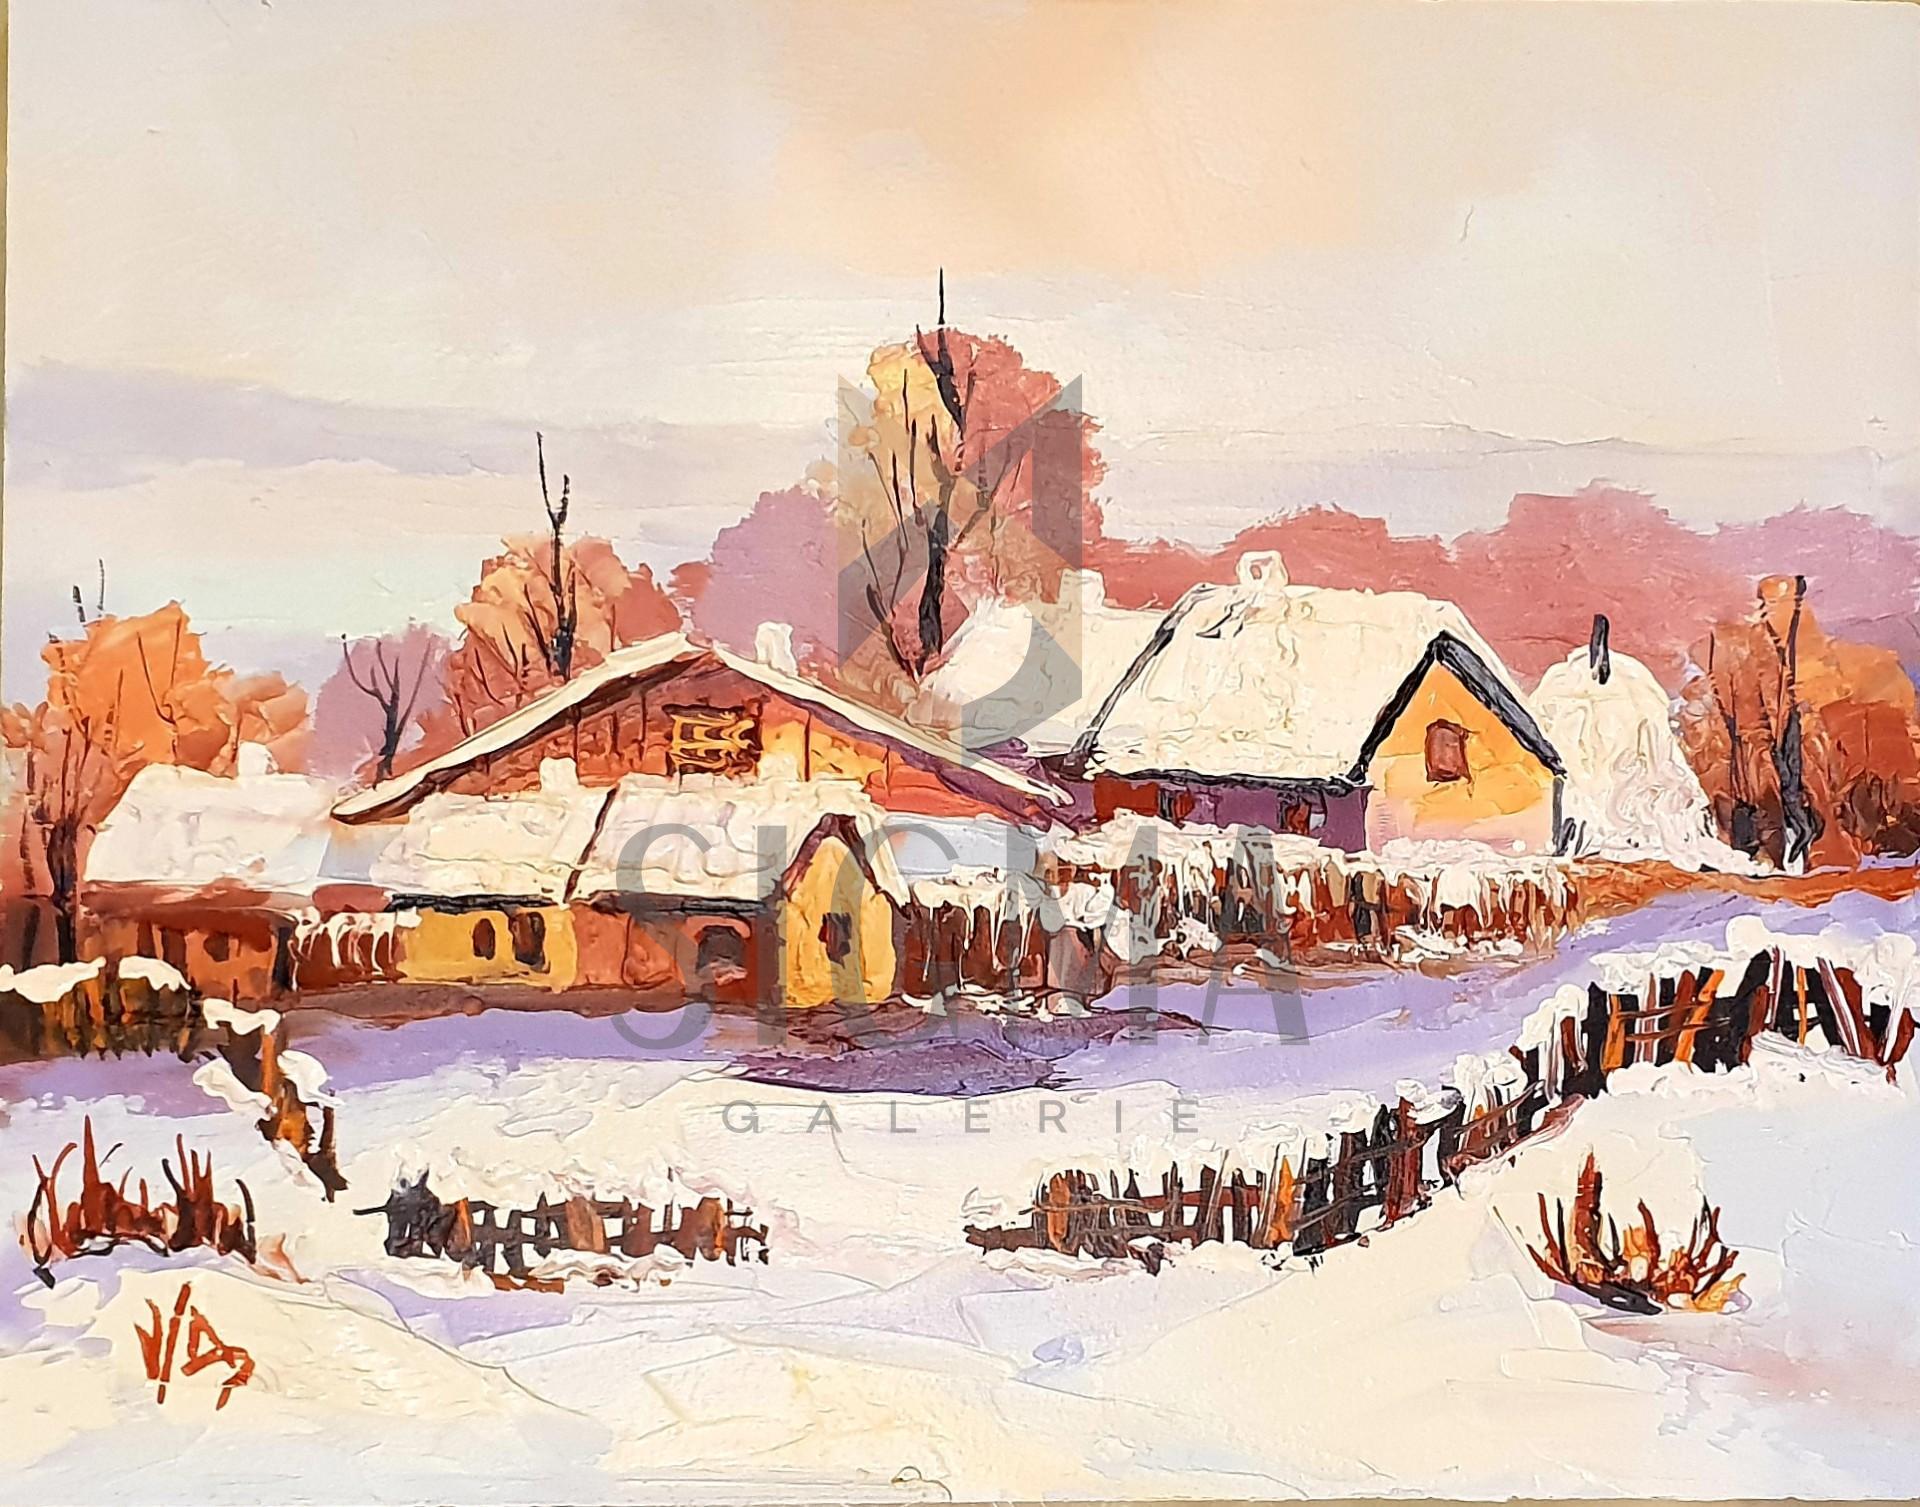 Tablou, - Peisaj de iarna - ulei pe carton,  18 x 23 cm, semnate in monograma V/A